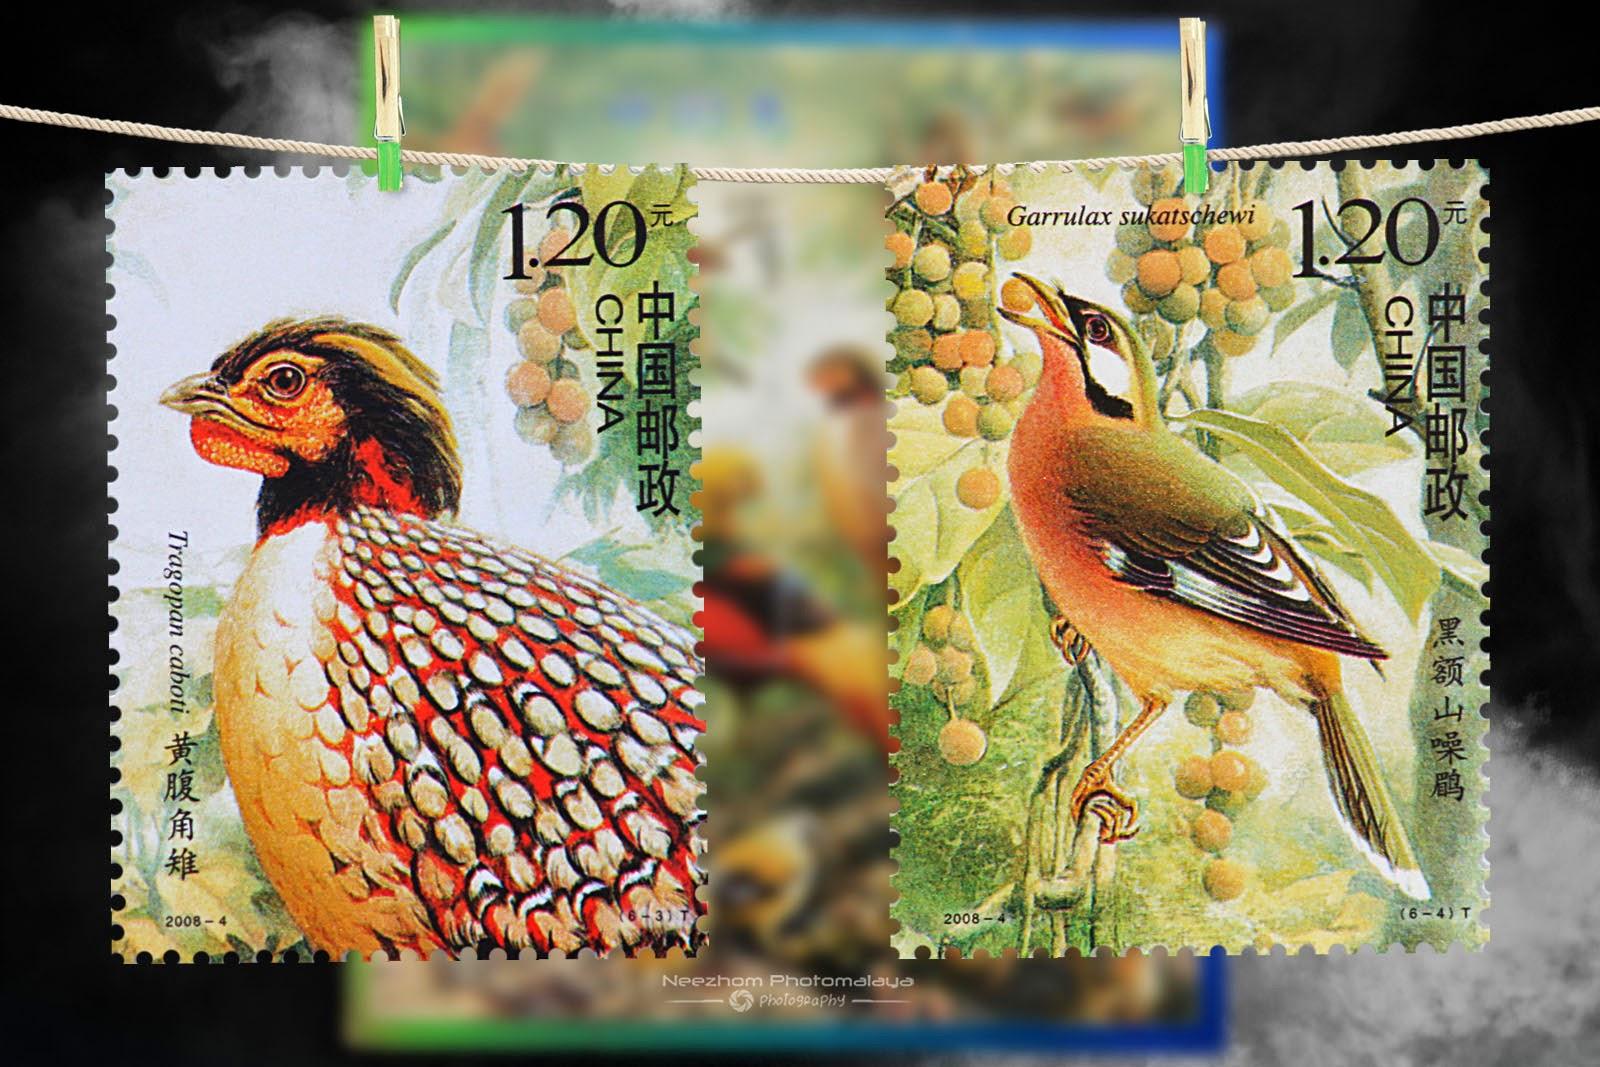 2008 Birds of China stamps - Tragopan cabati, Garrulax sukatschewi